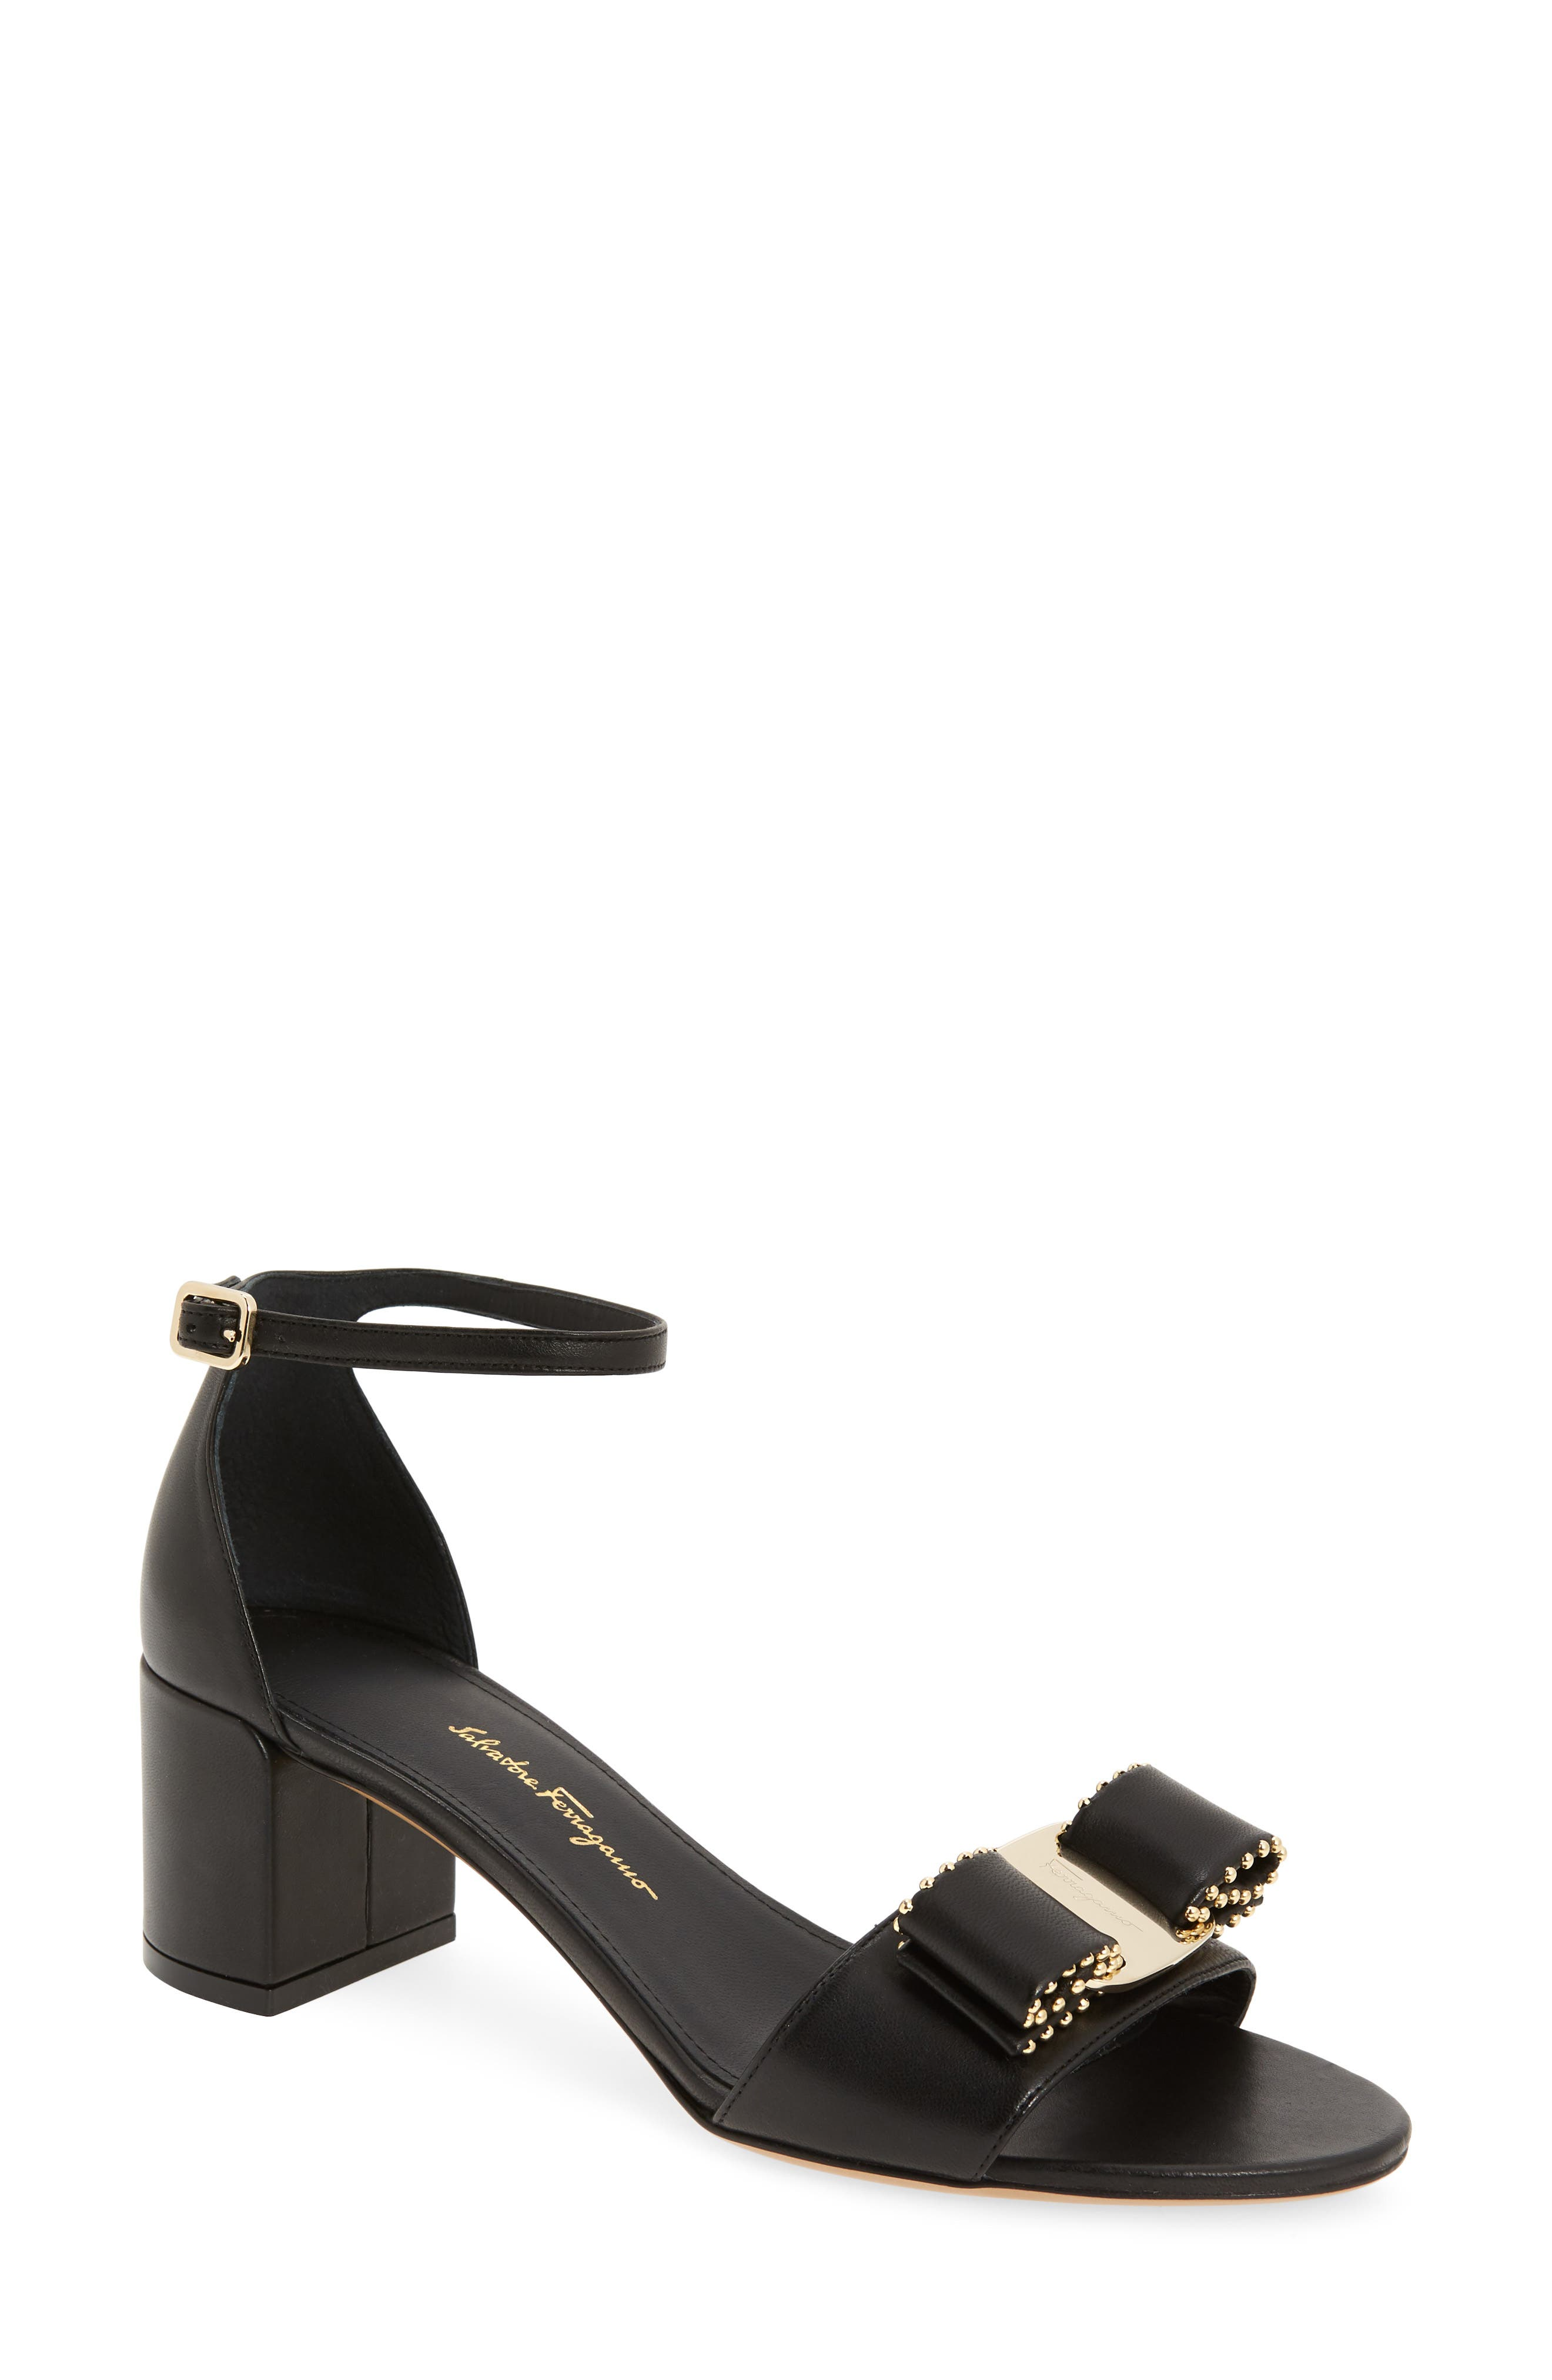 Gavina Sandal,                         Main,                         color, BLACK/ GOLD